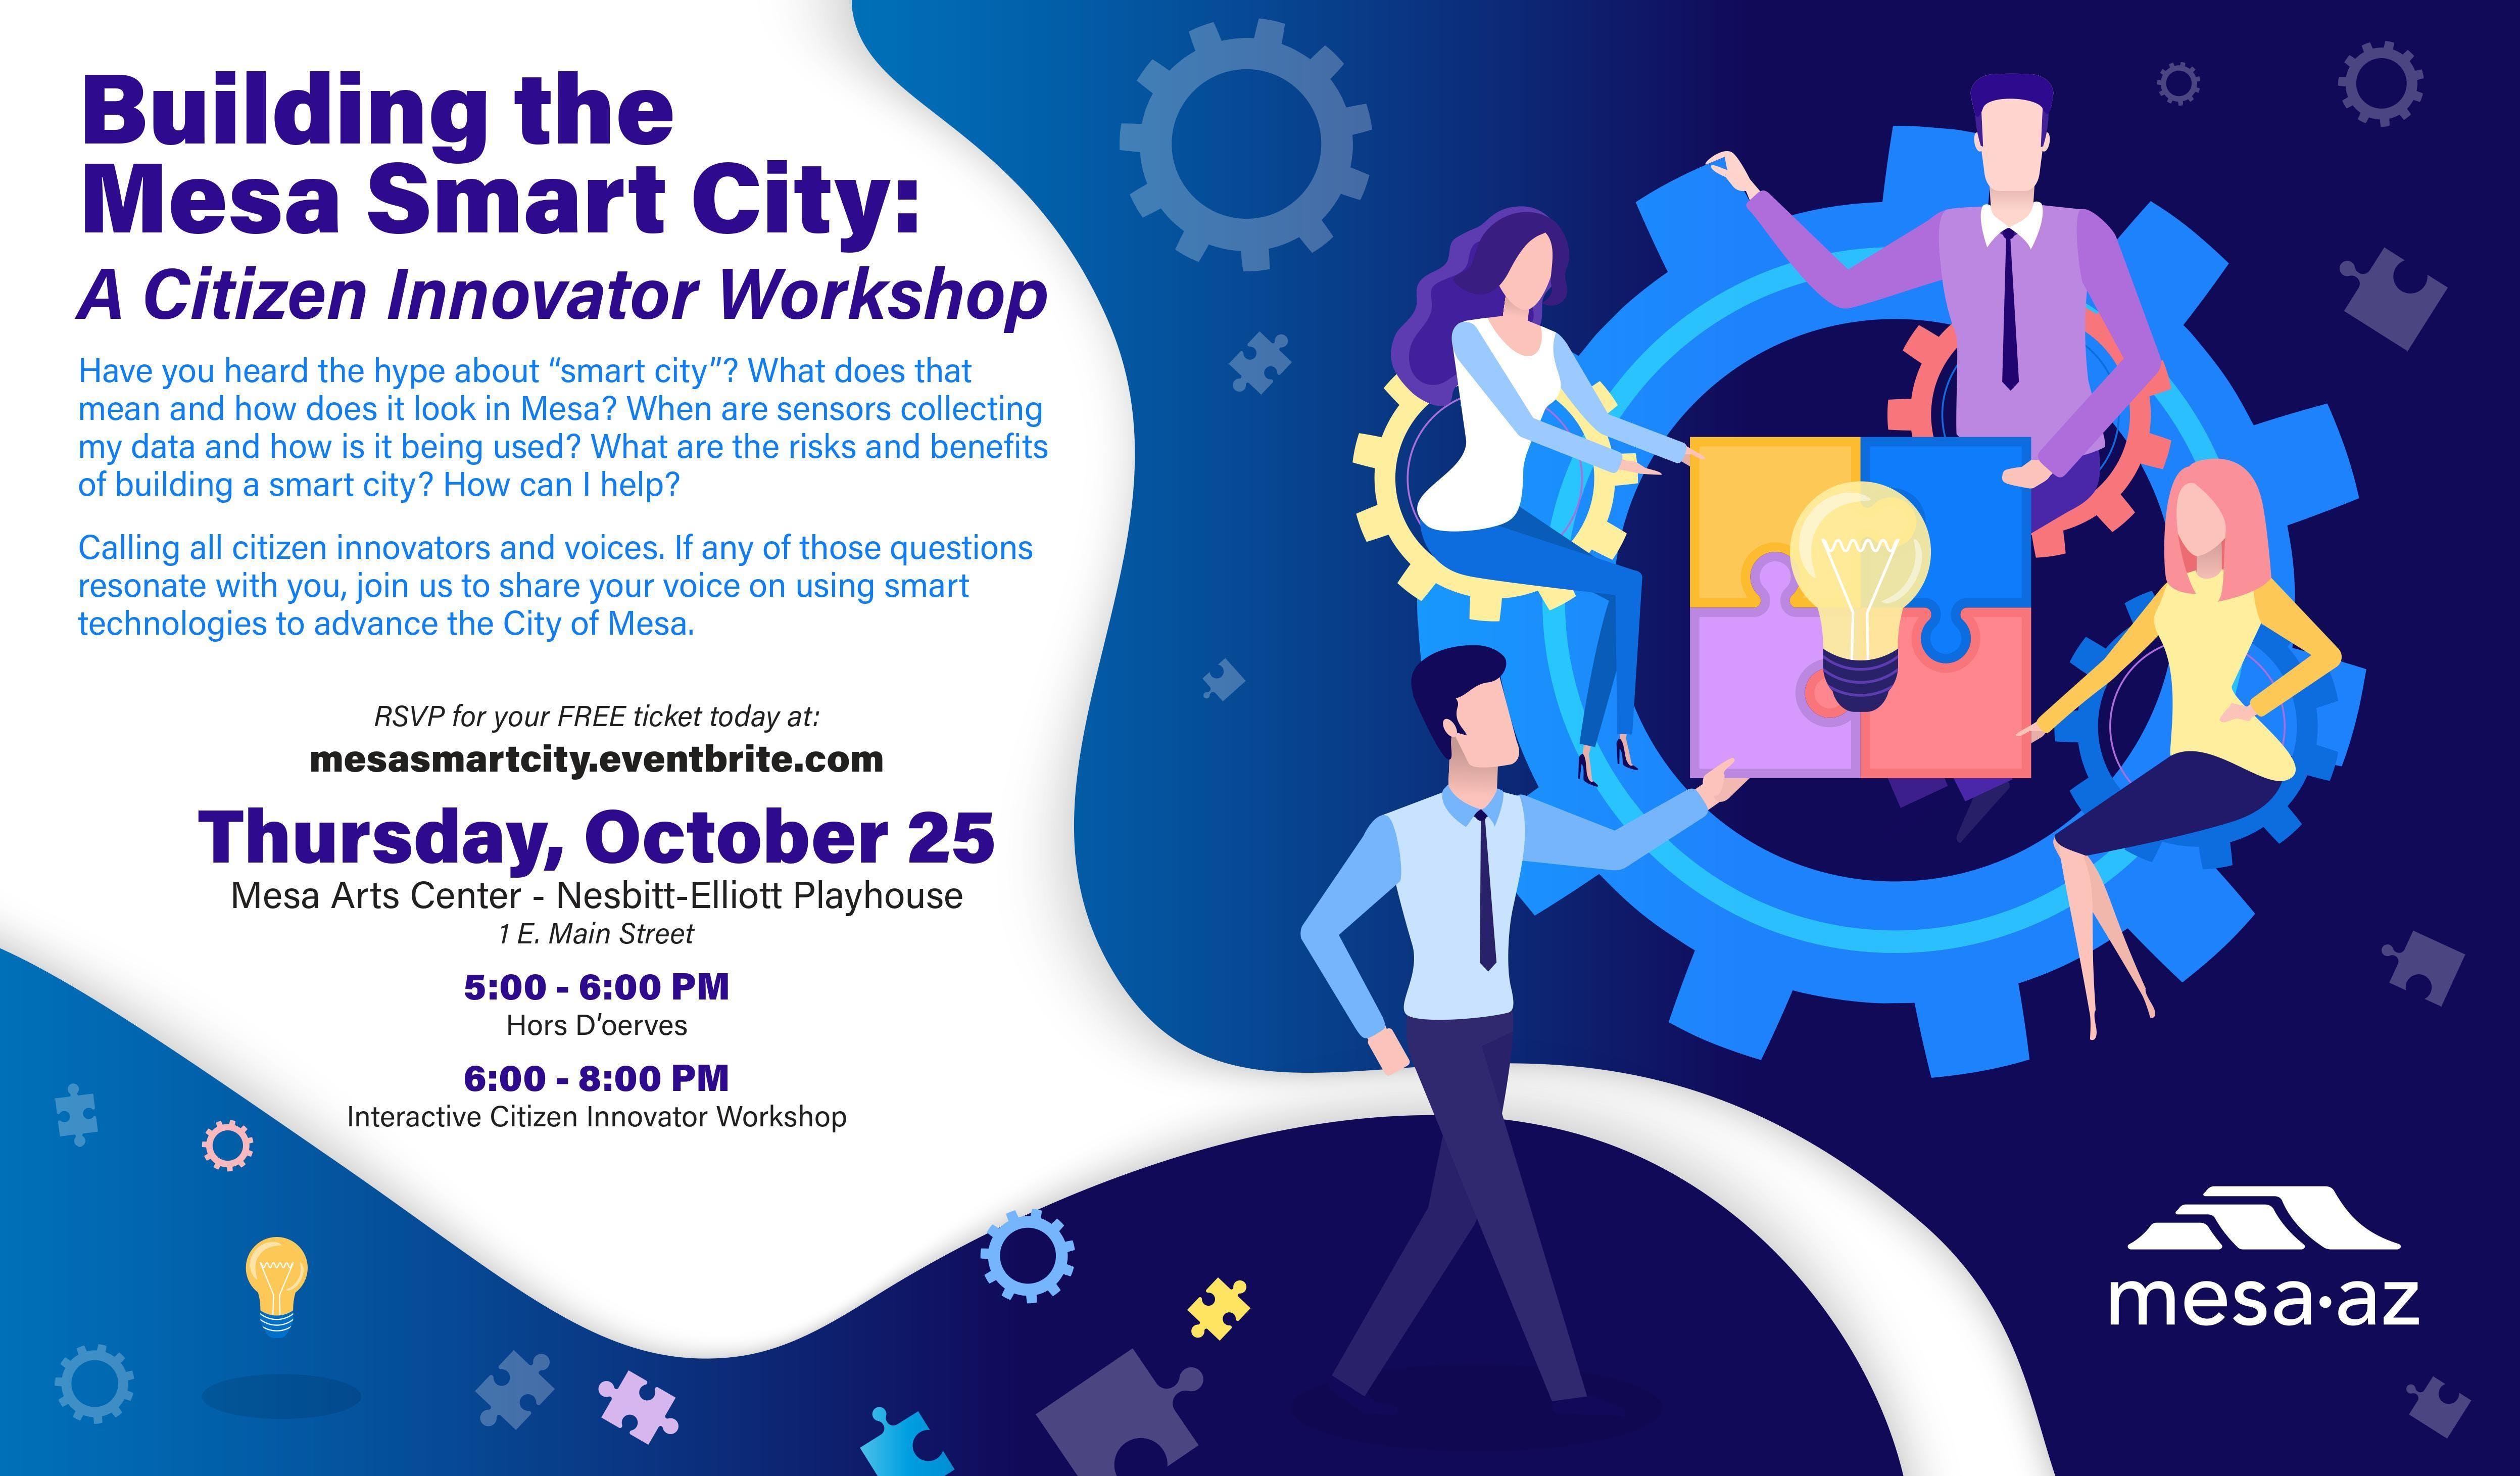 Building a Smart City in Mesa: A Citizen Innovator Workshop